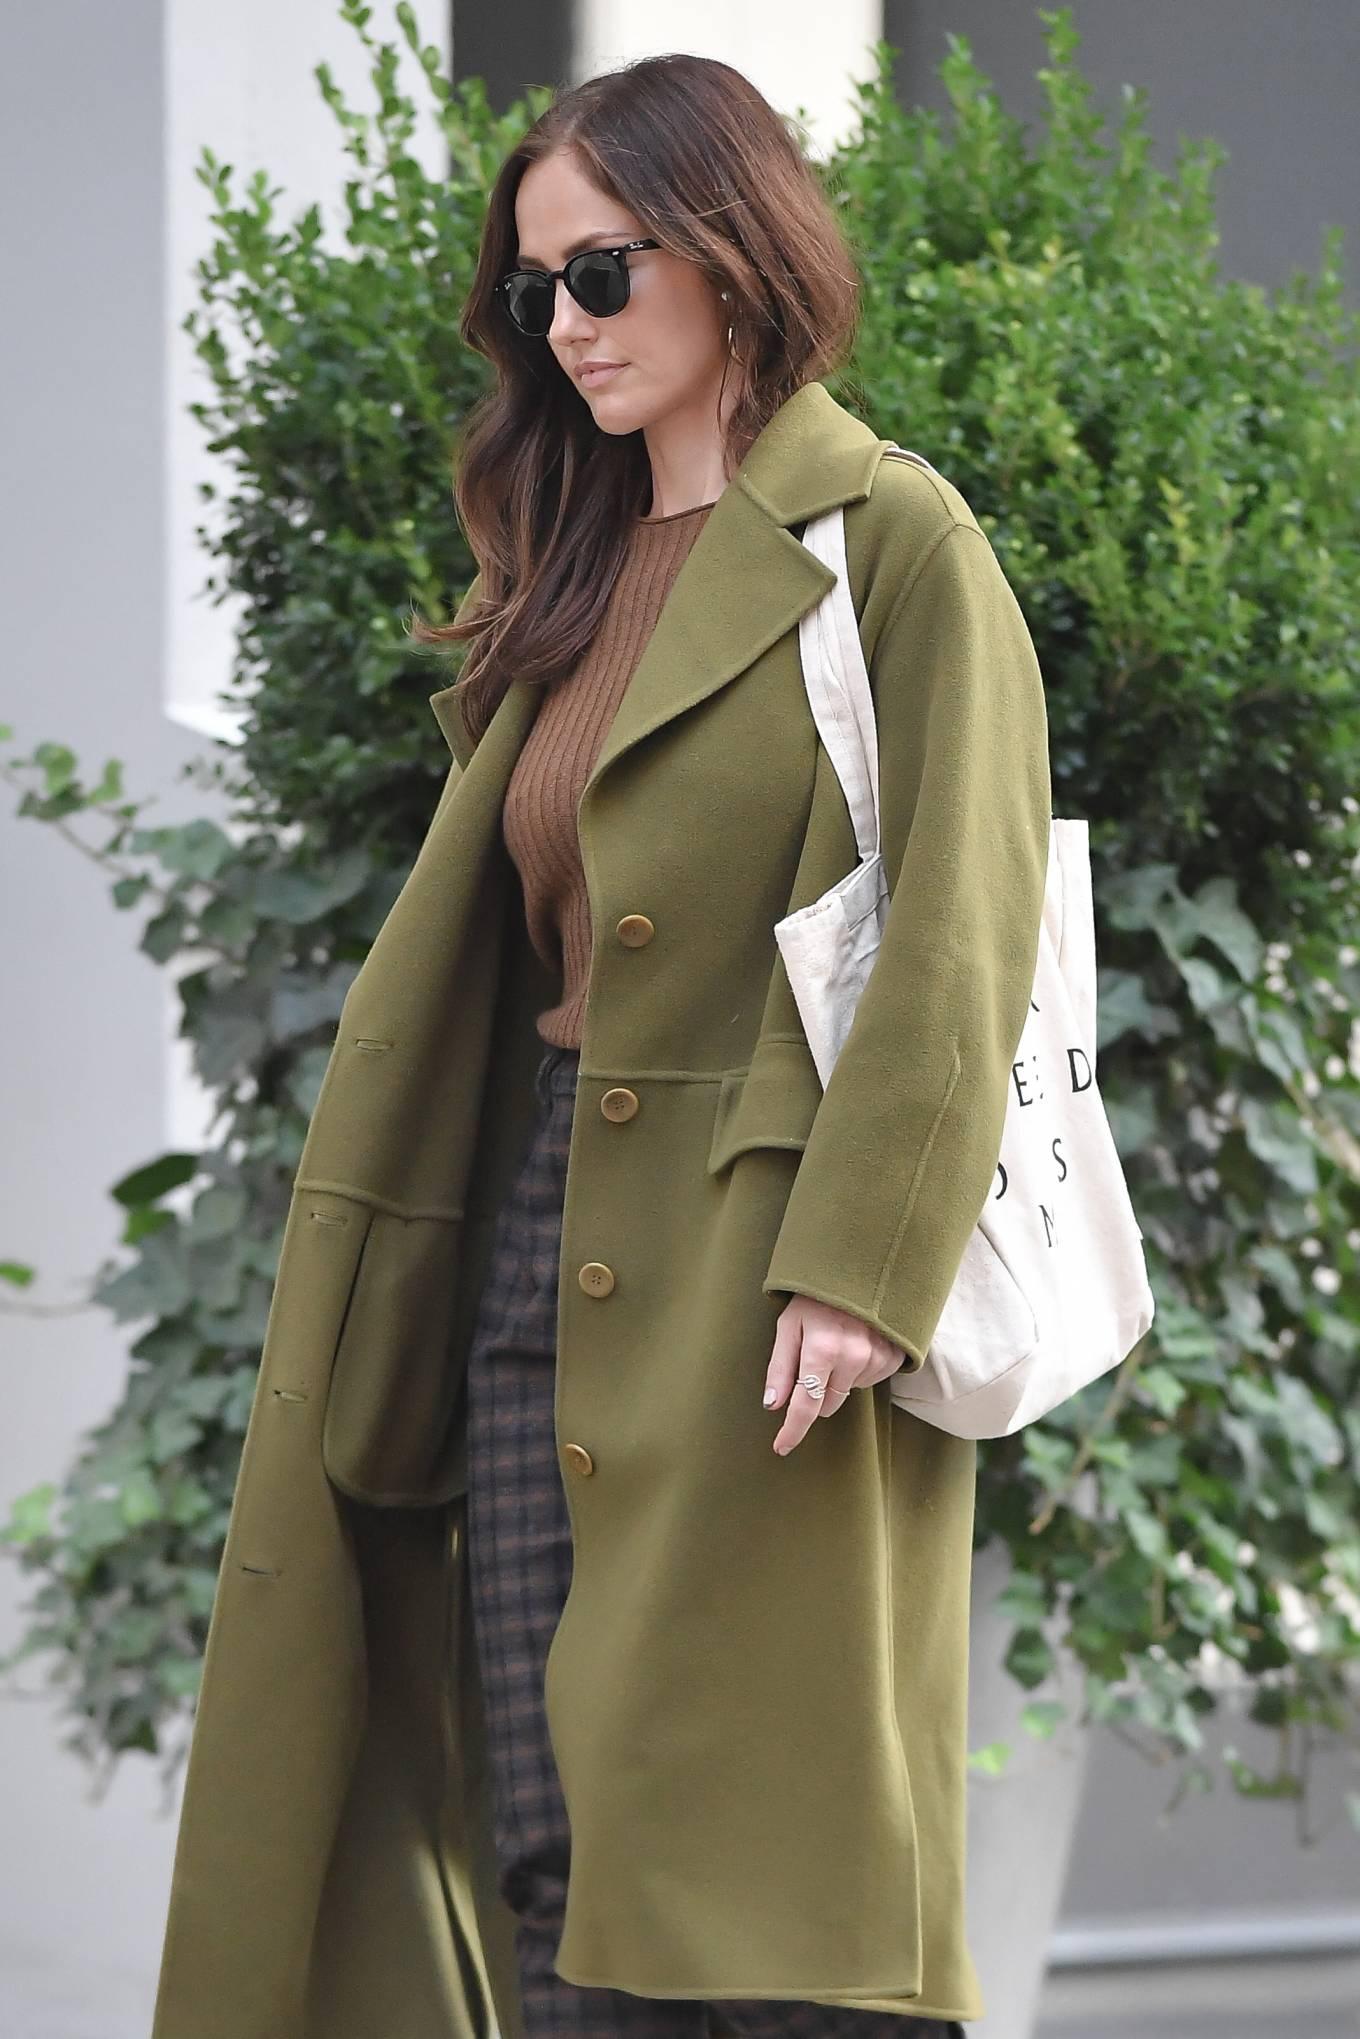 Minka Kelly 2021 : Minka Kelly – In olive green runs errands in New York-24